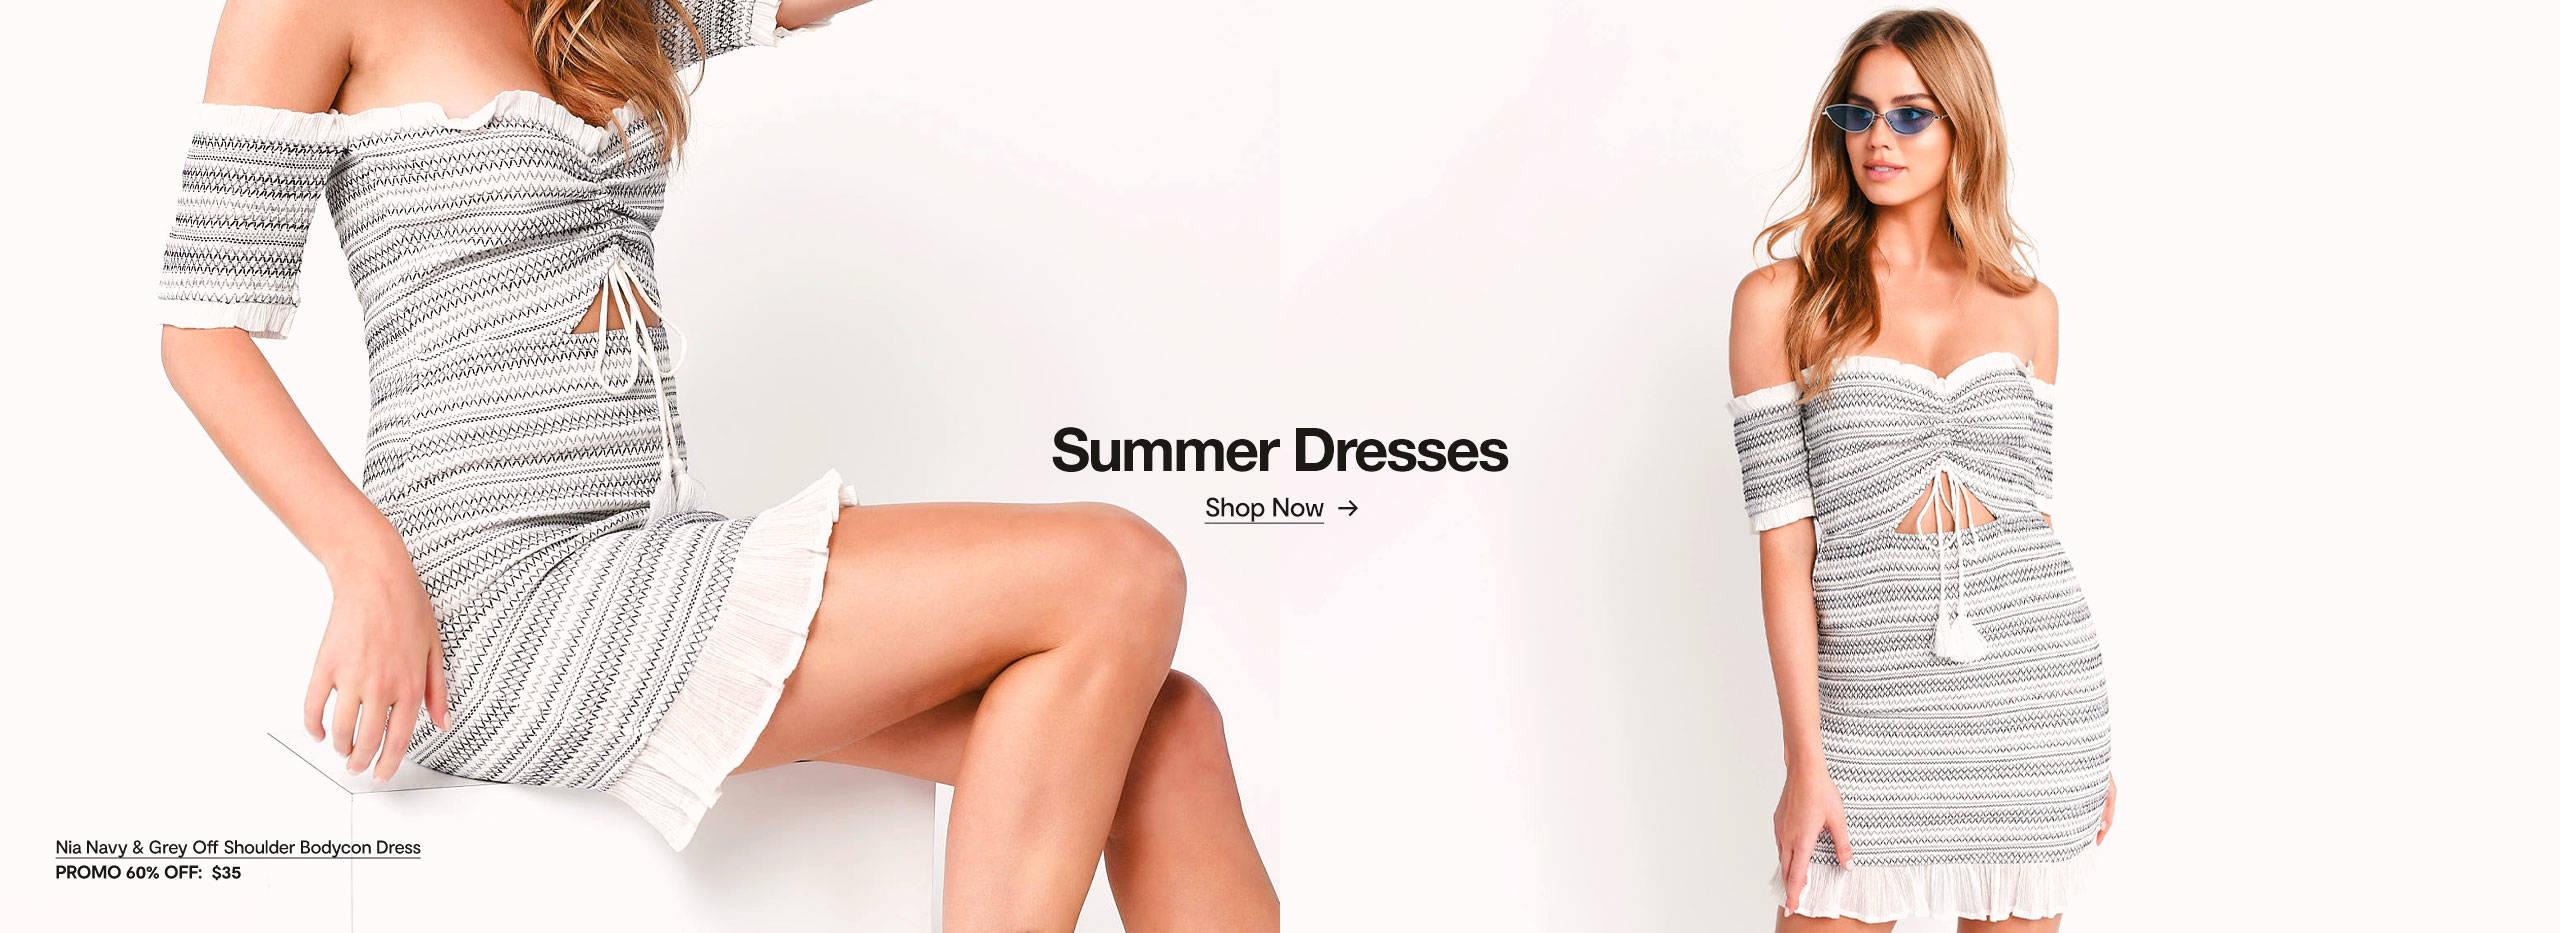 1a9183ba8e8 Tobi - Online Shopping Website for Women